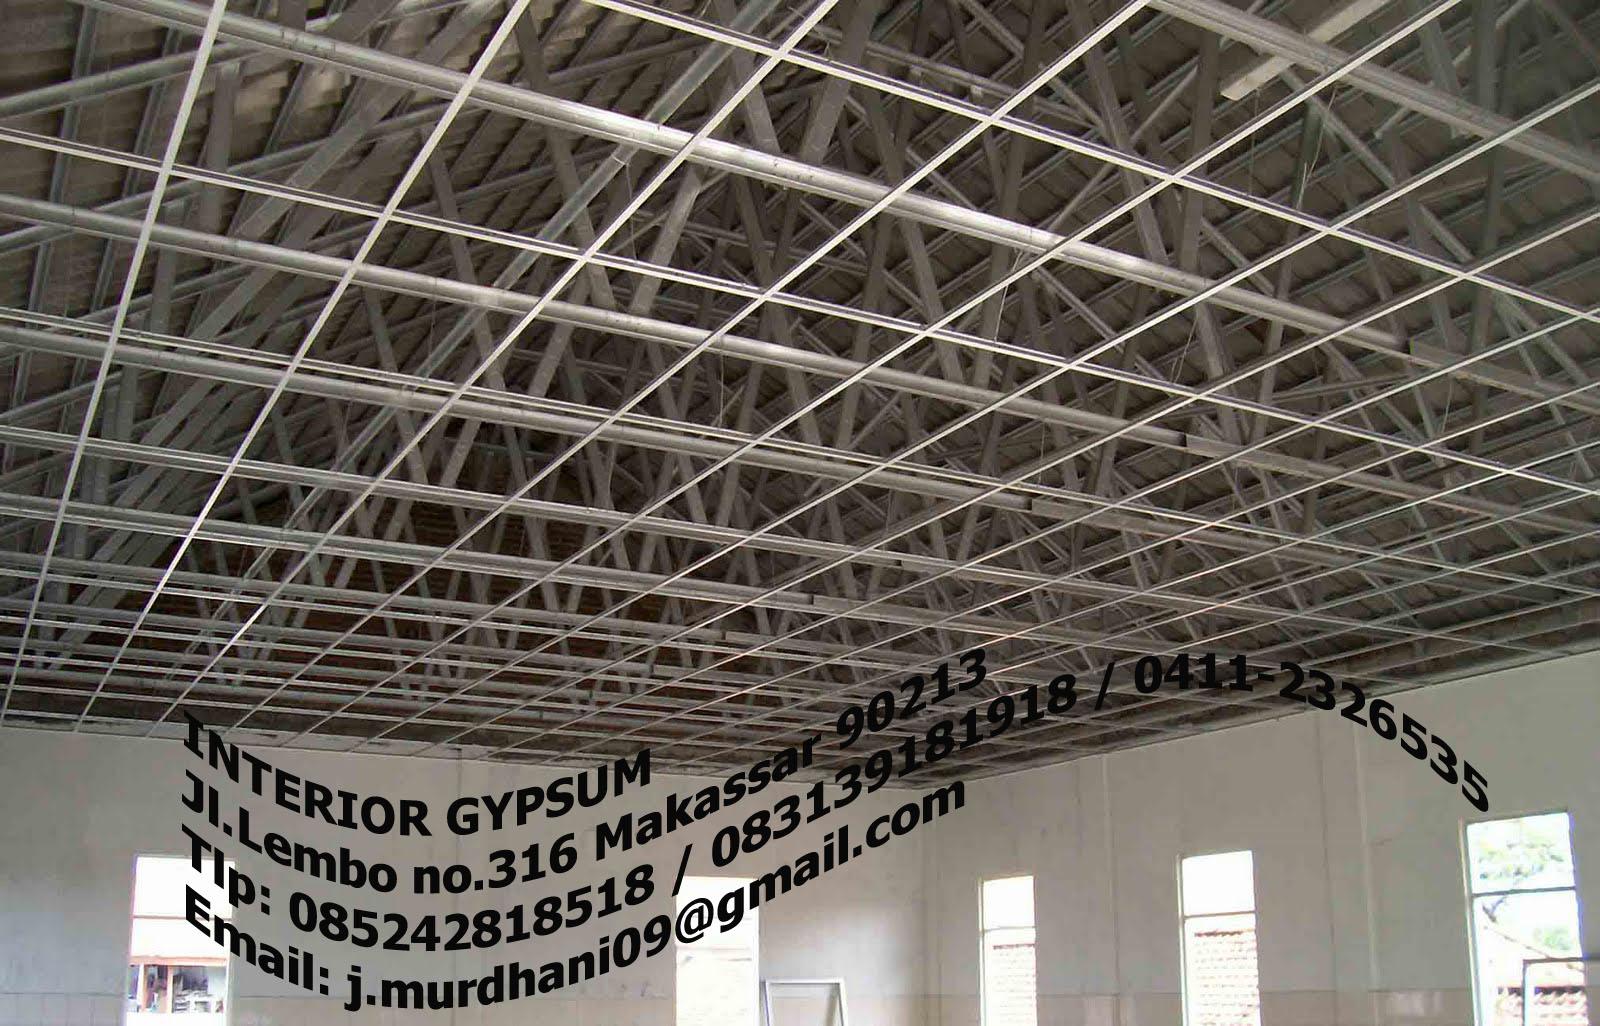 Desain Rangka Plafon Gypsum Sobat Interior Rumah